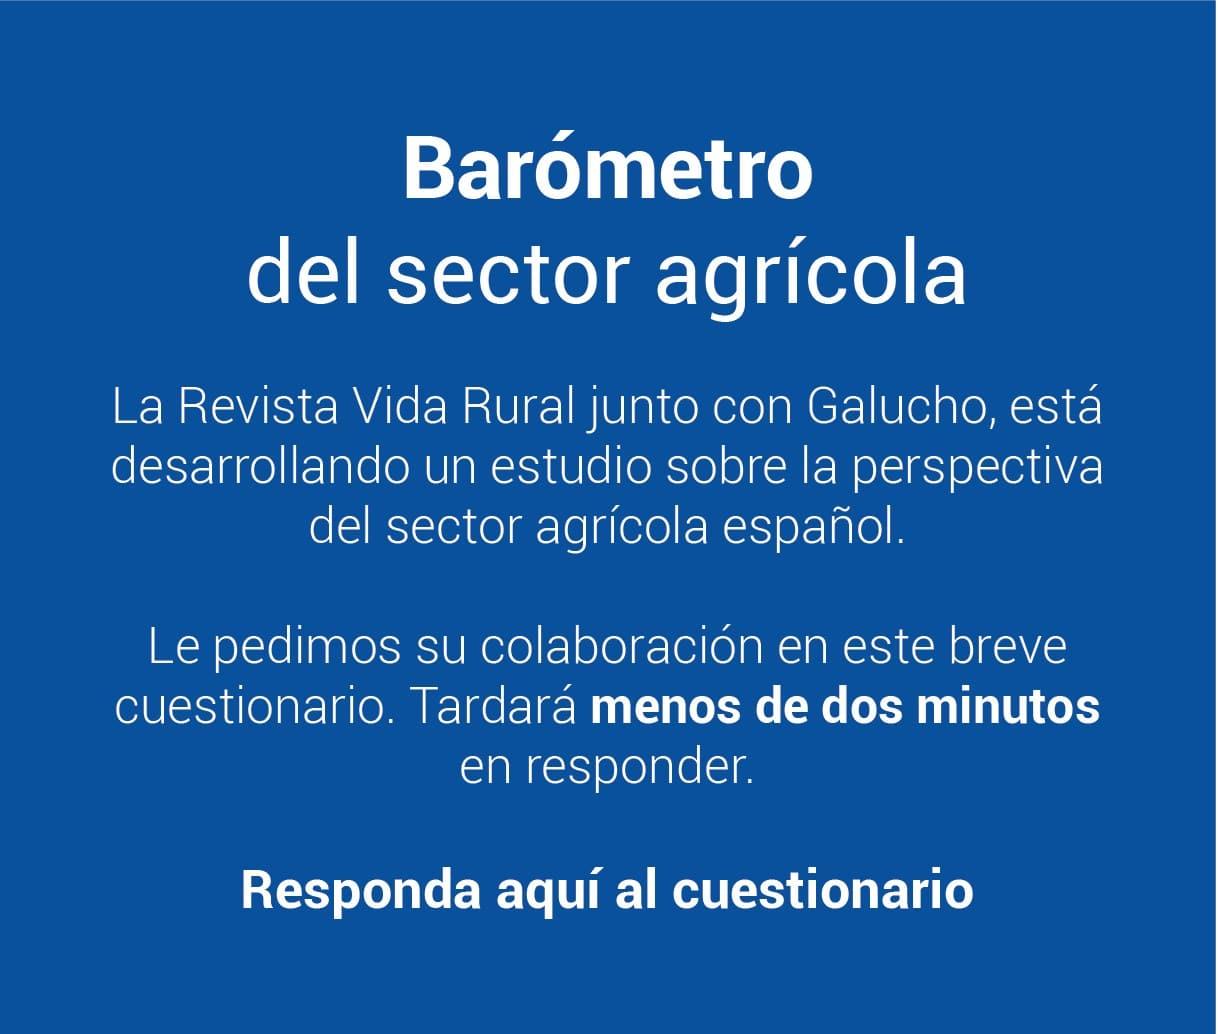 BAROMETRO 292×248